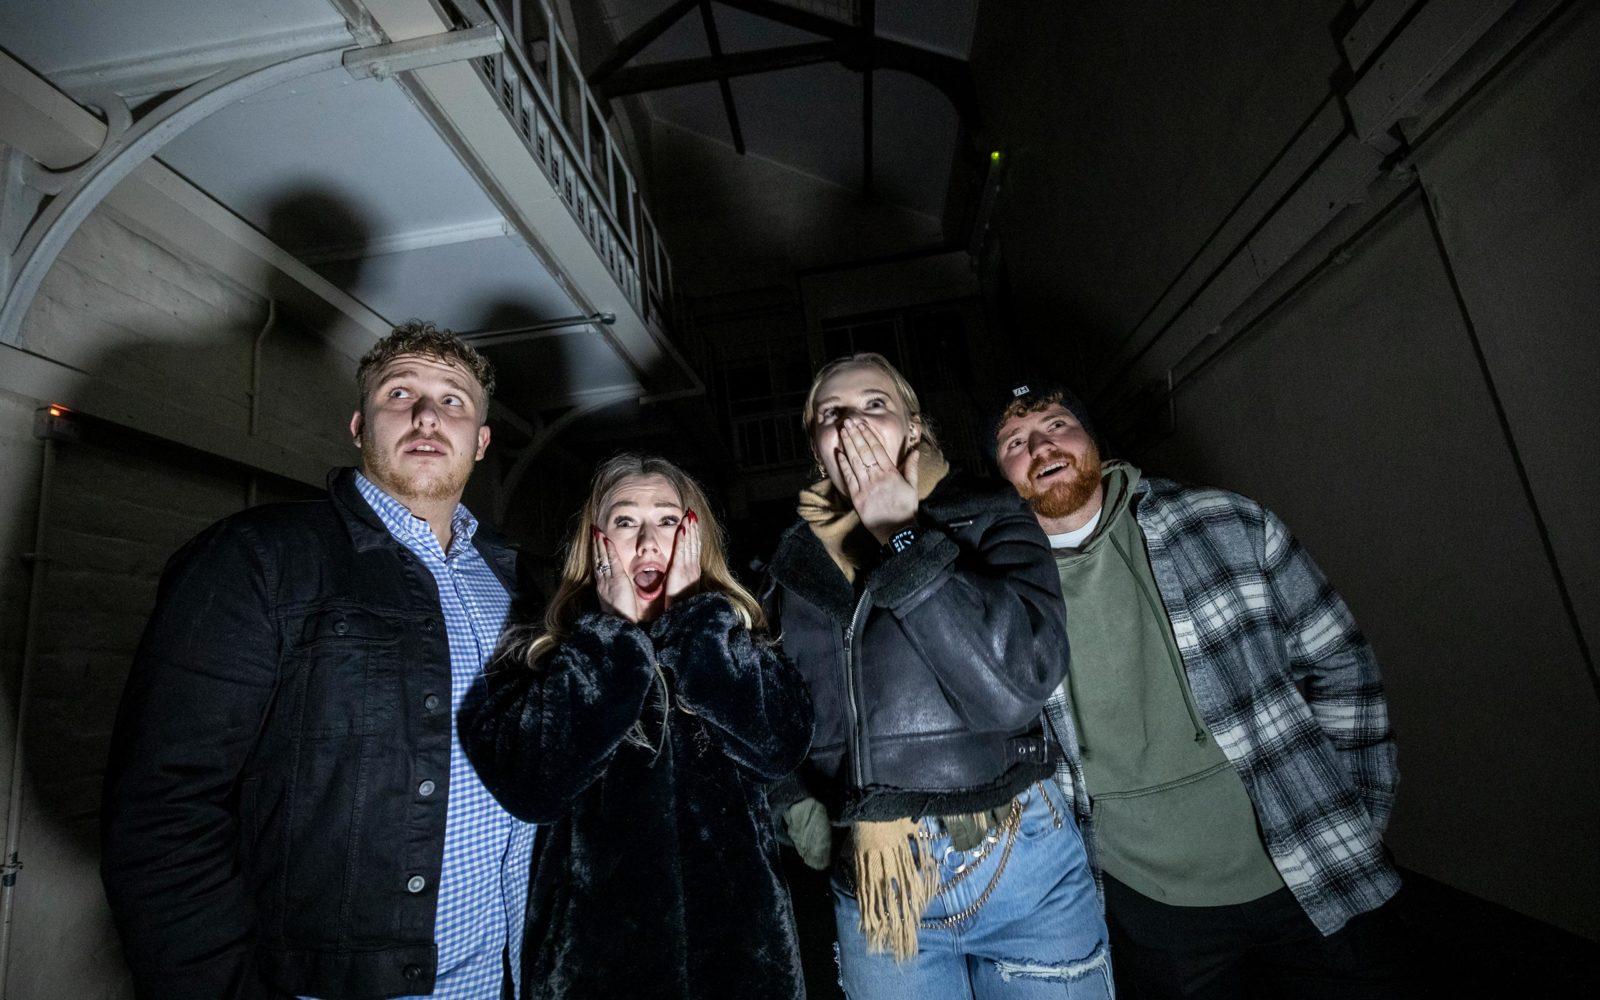 Shepton Mallet Prison Ghost Tour